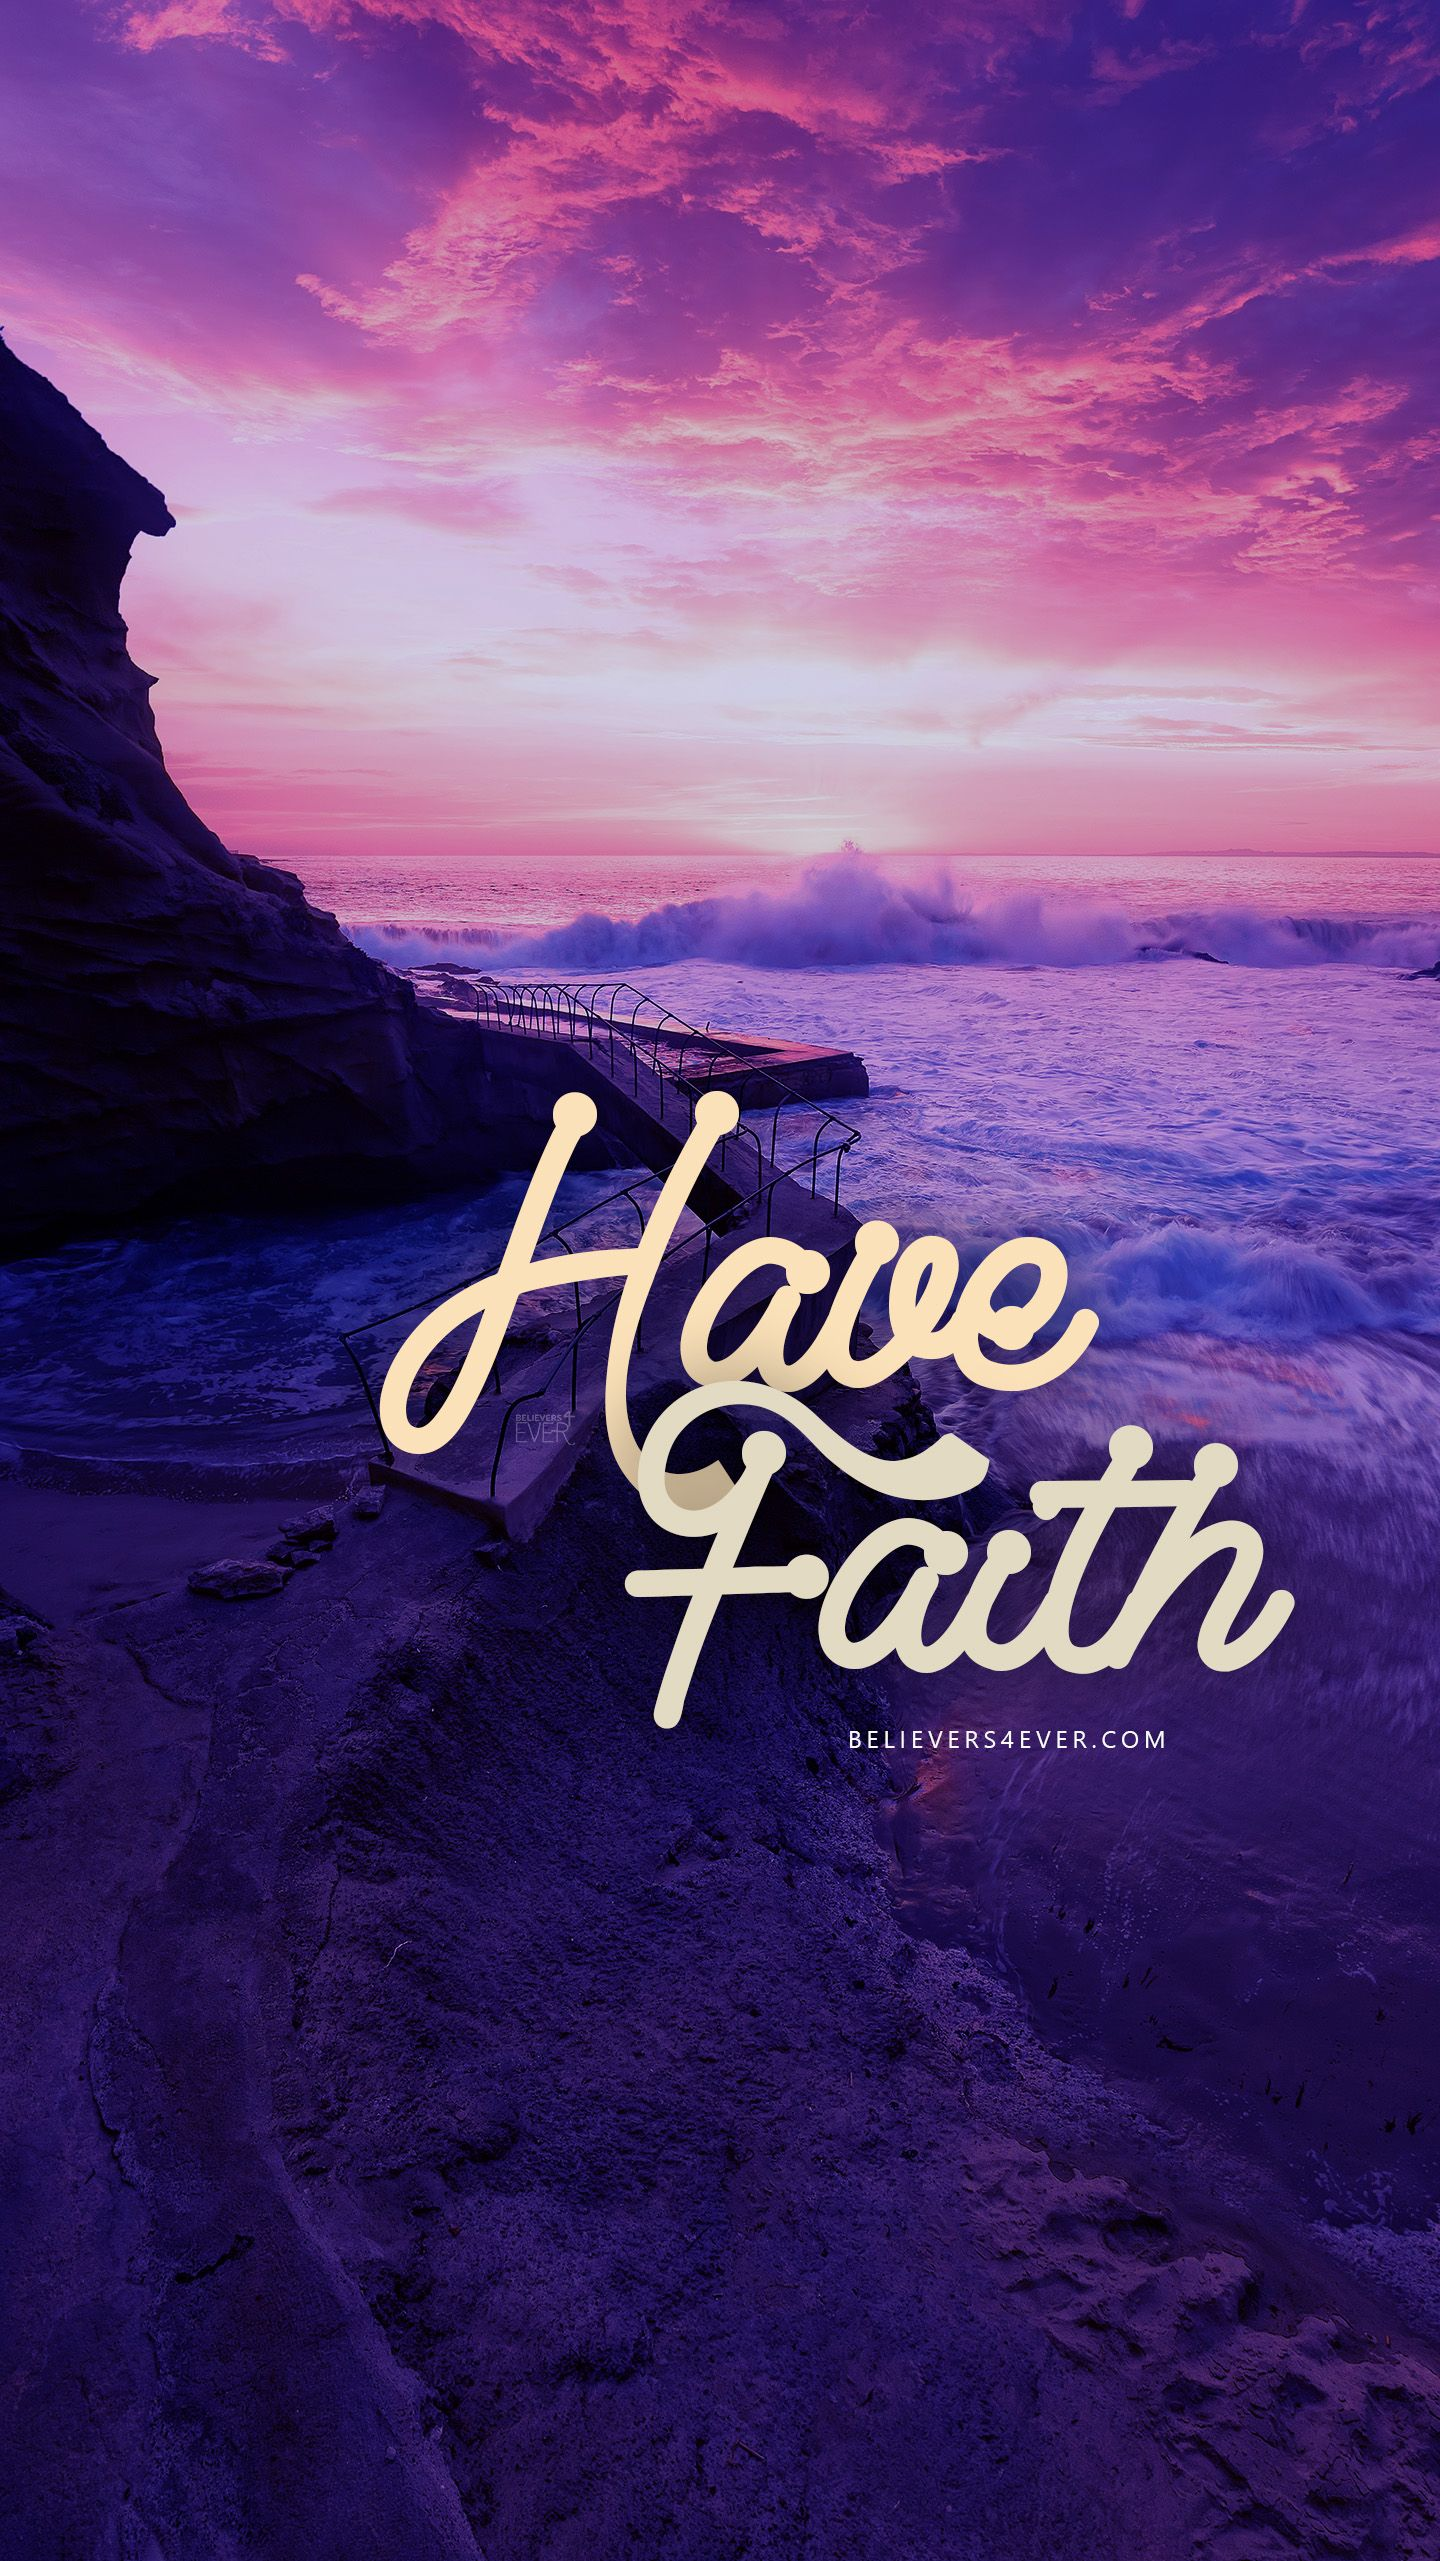 Have Faith   Wallpaper   Pinterest   Mobile wallpaper, Wallpaper backgrounds and Wallpaper